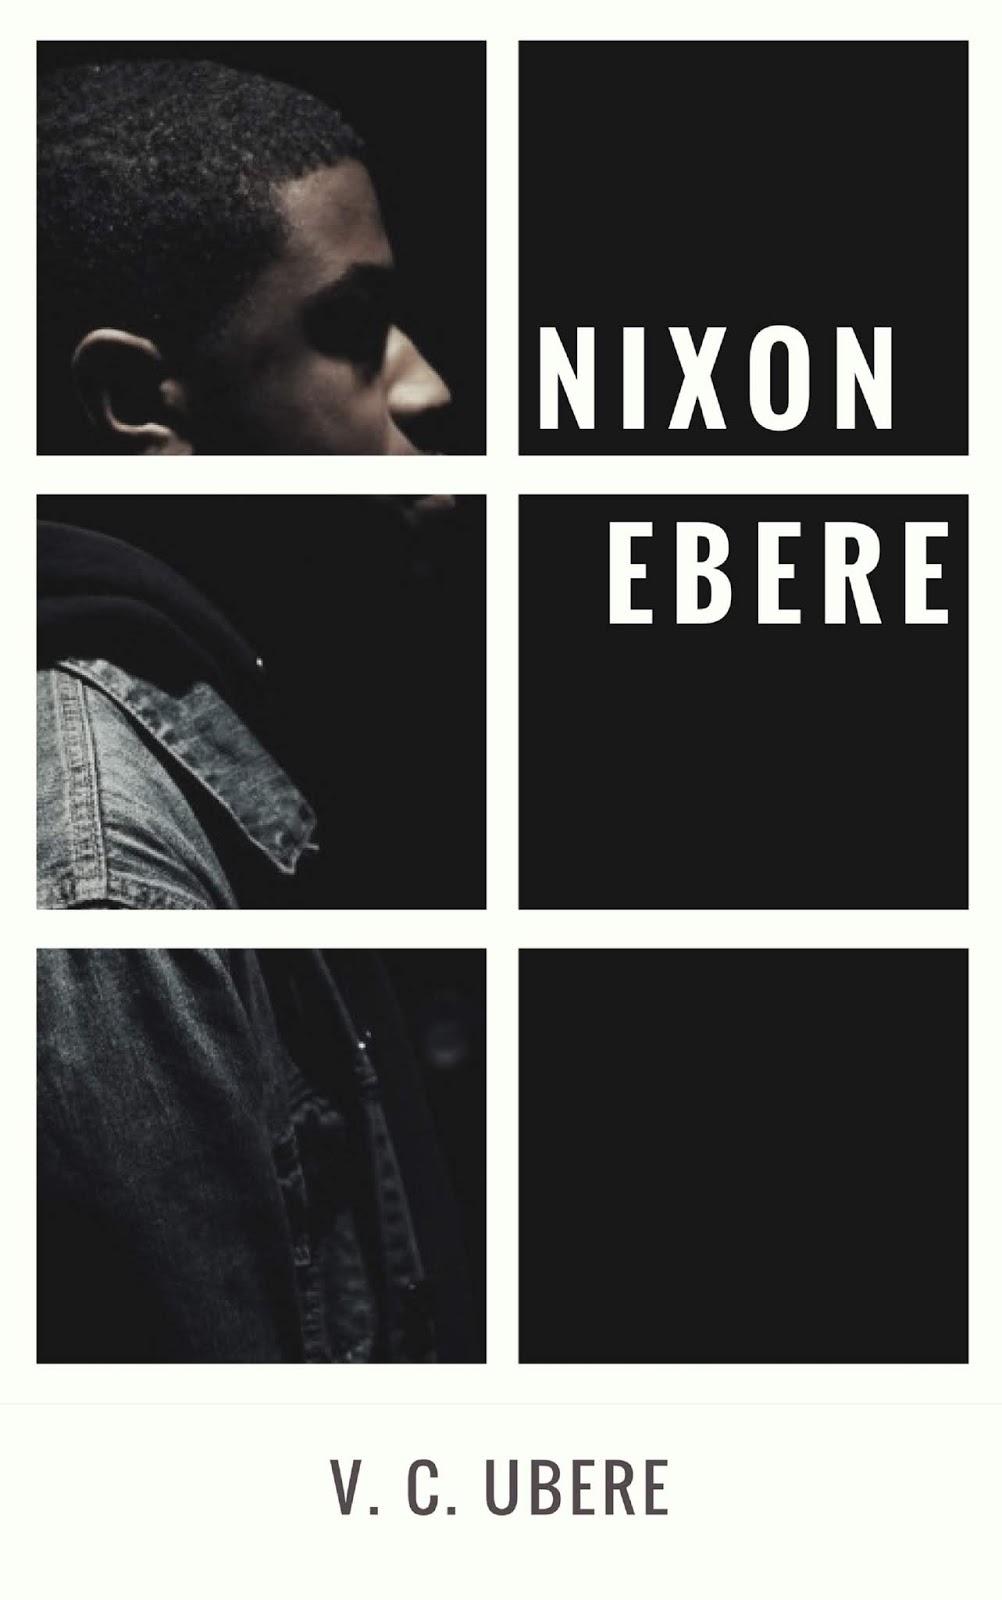 Nixon Ebere by V. C. Ubere